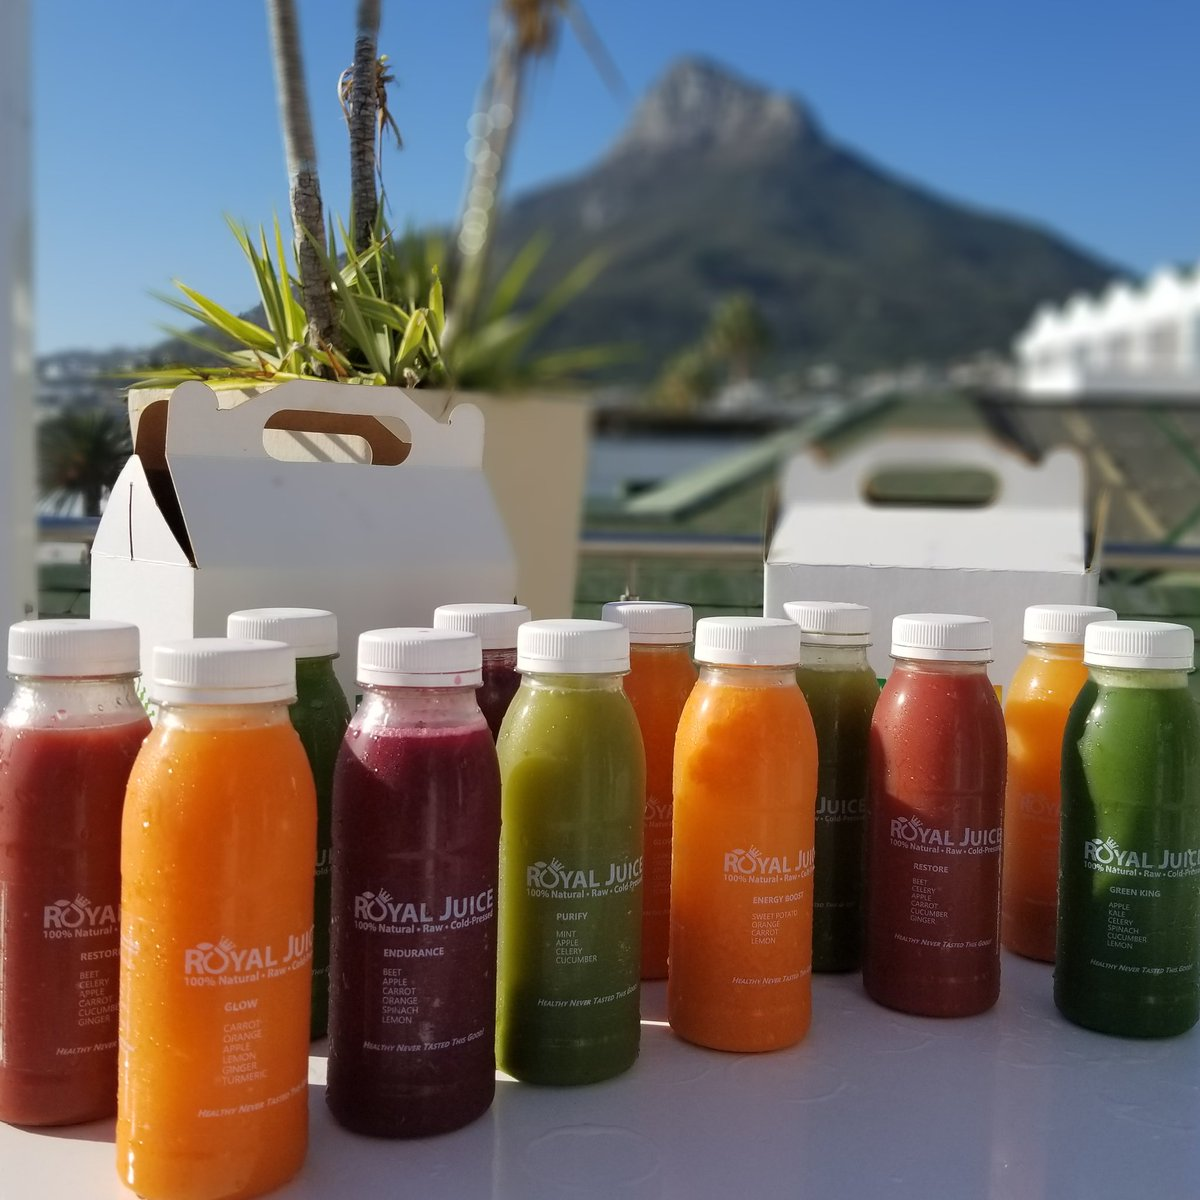 Start your week 100%Natural  http:// royaljuice.co.za  &nbsp;   #cleaneating #eatclean #juice #juicing #detox #active #lifestyle #healthylife #healthylifestyle #healthybody #healthymind #health #weightloss #weightlossjourney #vegan #plantbased #veganfoodshare #fitness #CapeTown #lovecapetown<br>http://pic.twitter.com/SovQjIJPhj